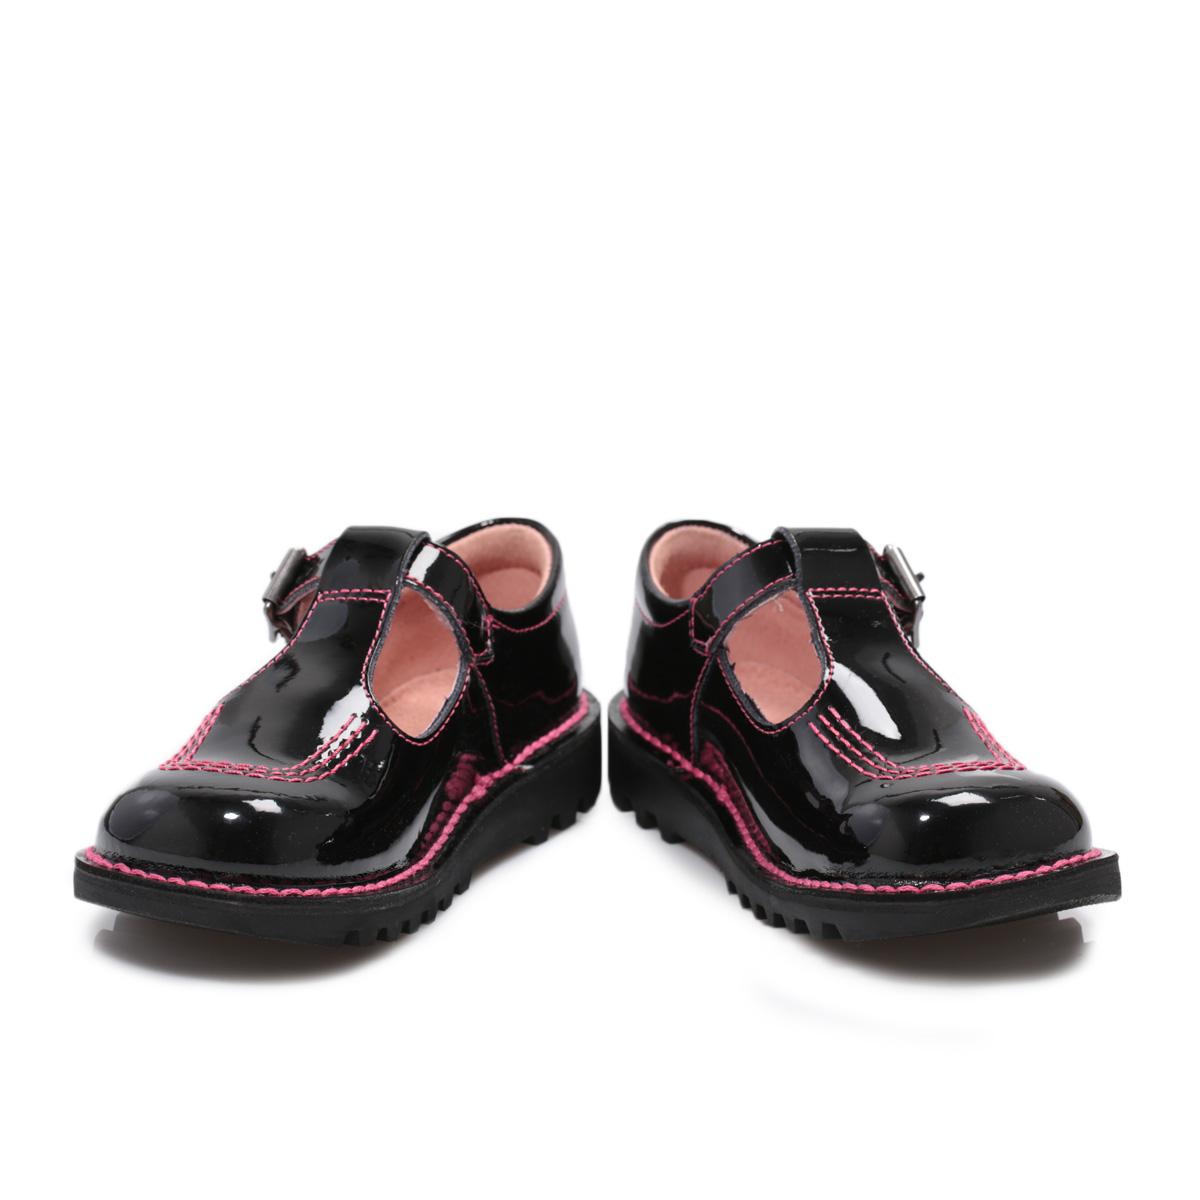 Black kicker sandals - Kickers Kick T Bar Core Kids Black Patent Leathe Sandals Shoes Size 8 5 11